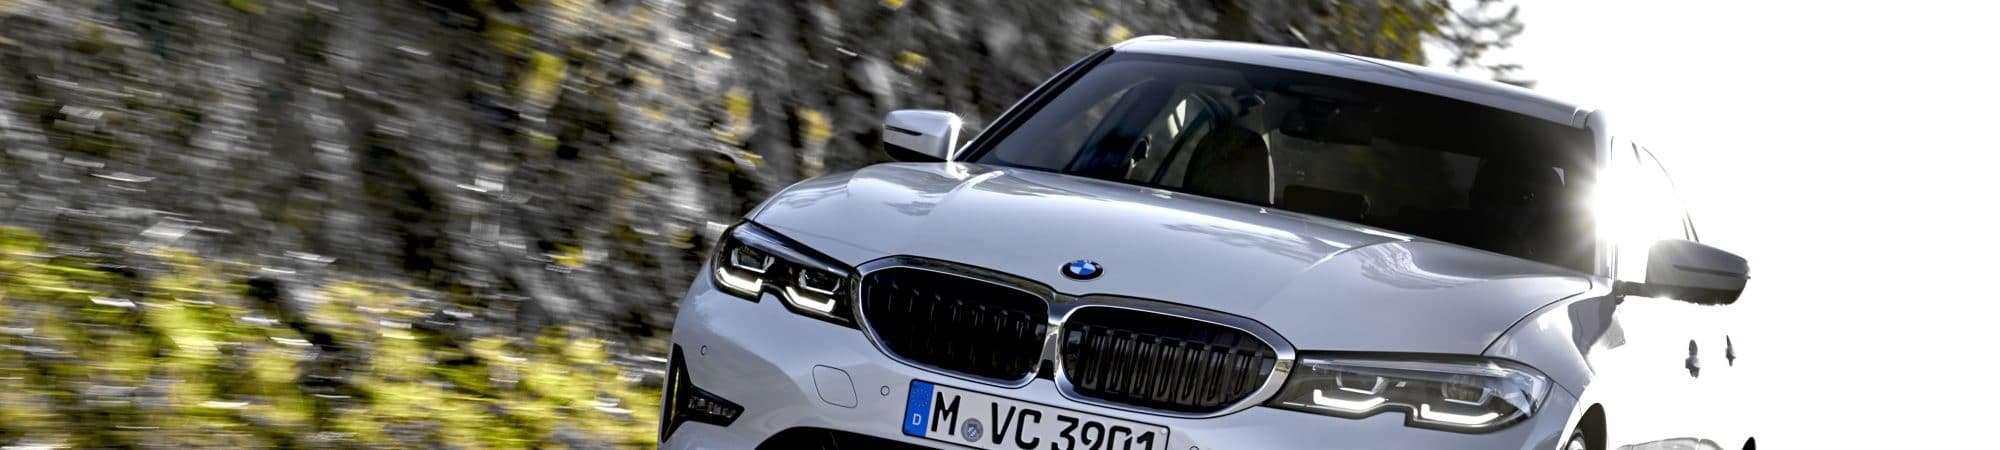 BMW 320i GP 2022 na estrada.